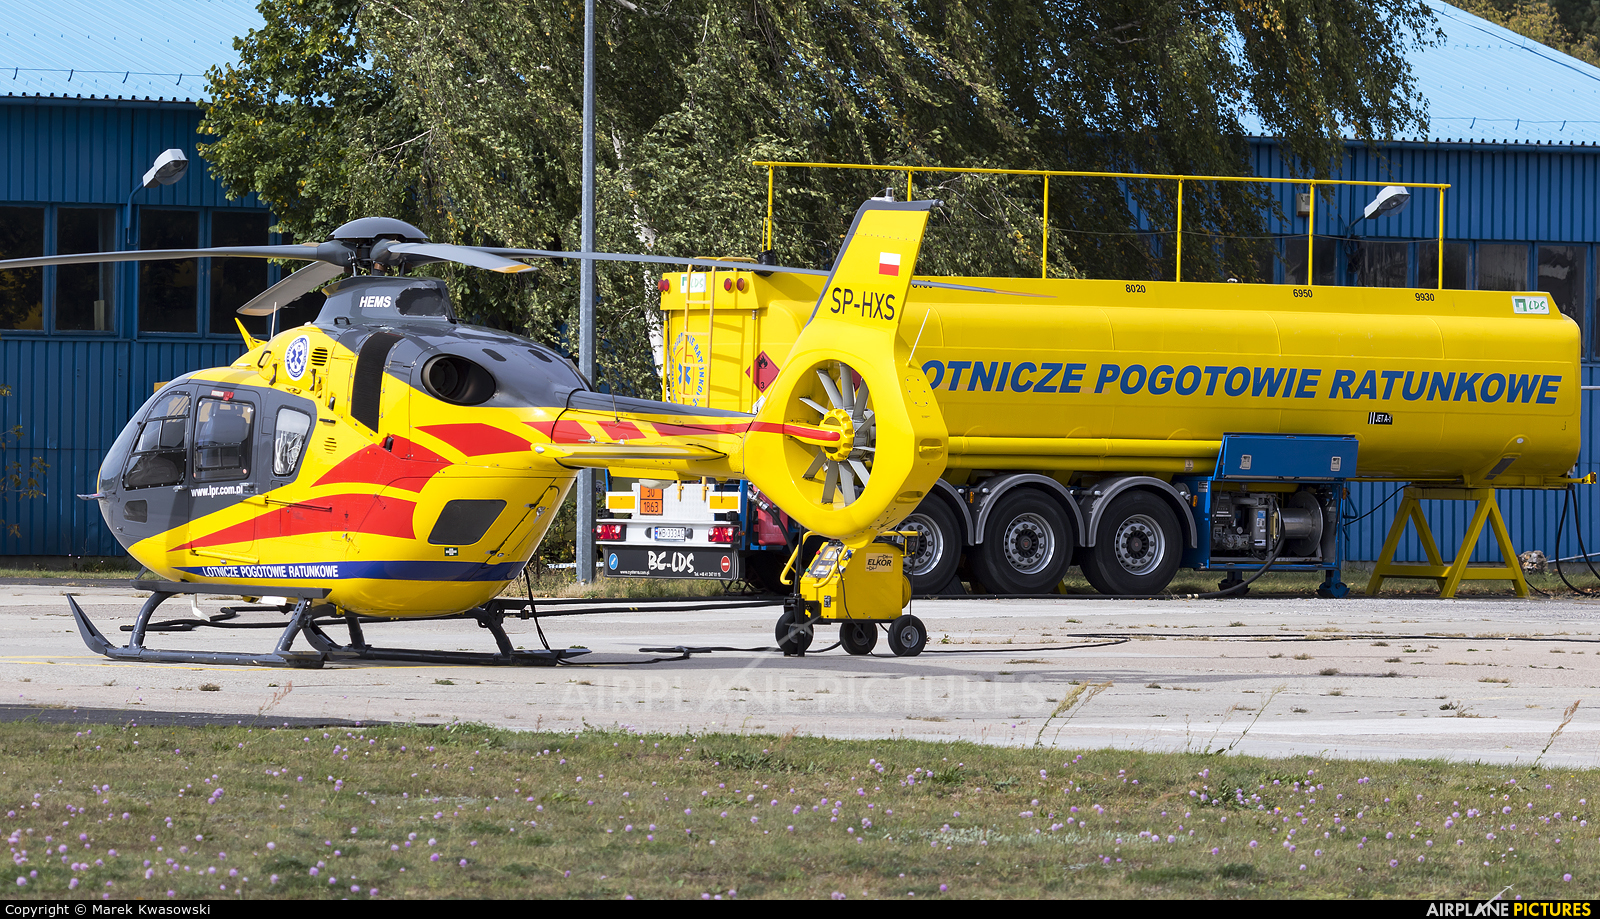 Polish Medical Air Rescue - Lotnicze Pogotowie Ratunkowe SP-HXS aircraft at Warsaw - Babice